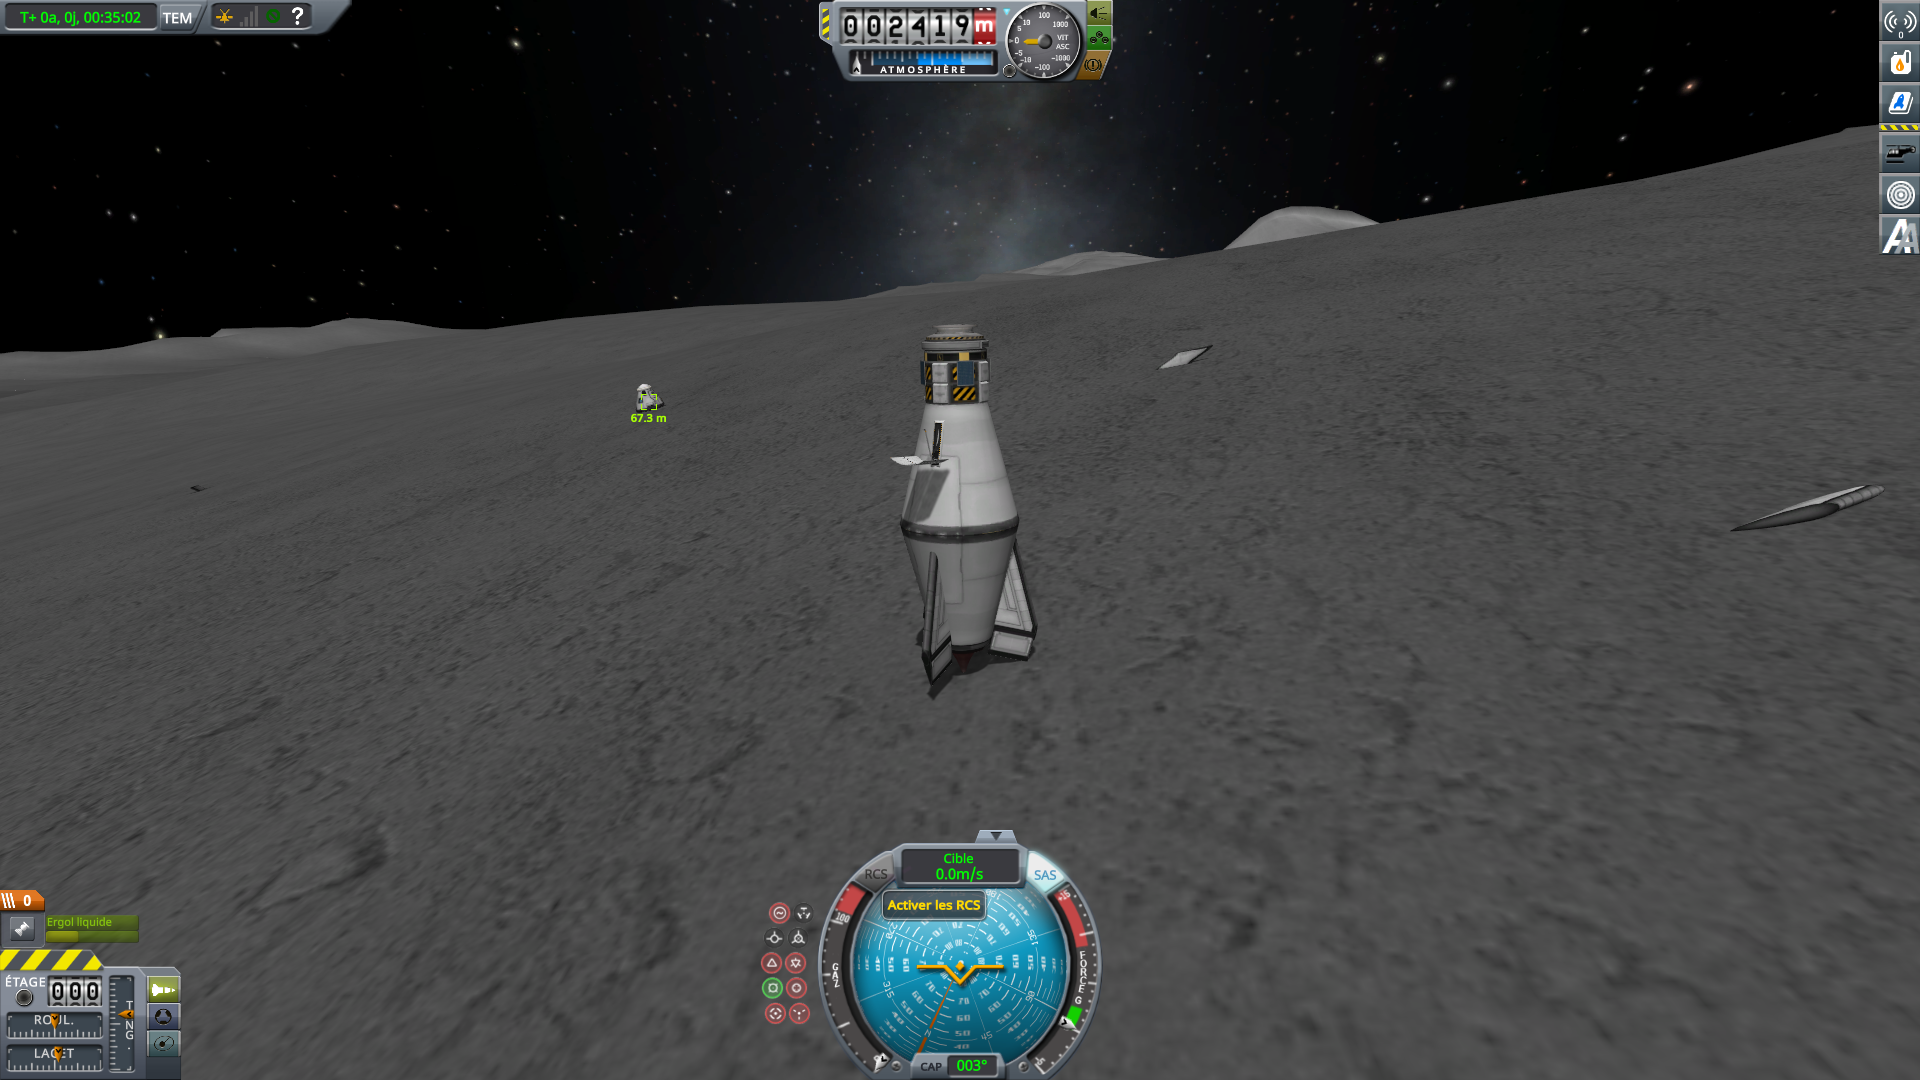 sauvetage sur la Lune